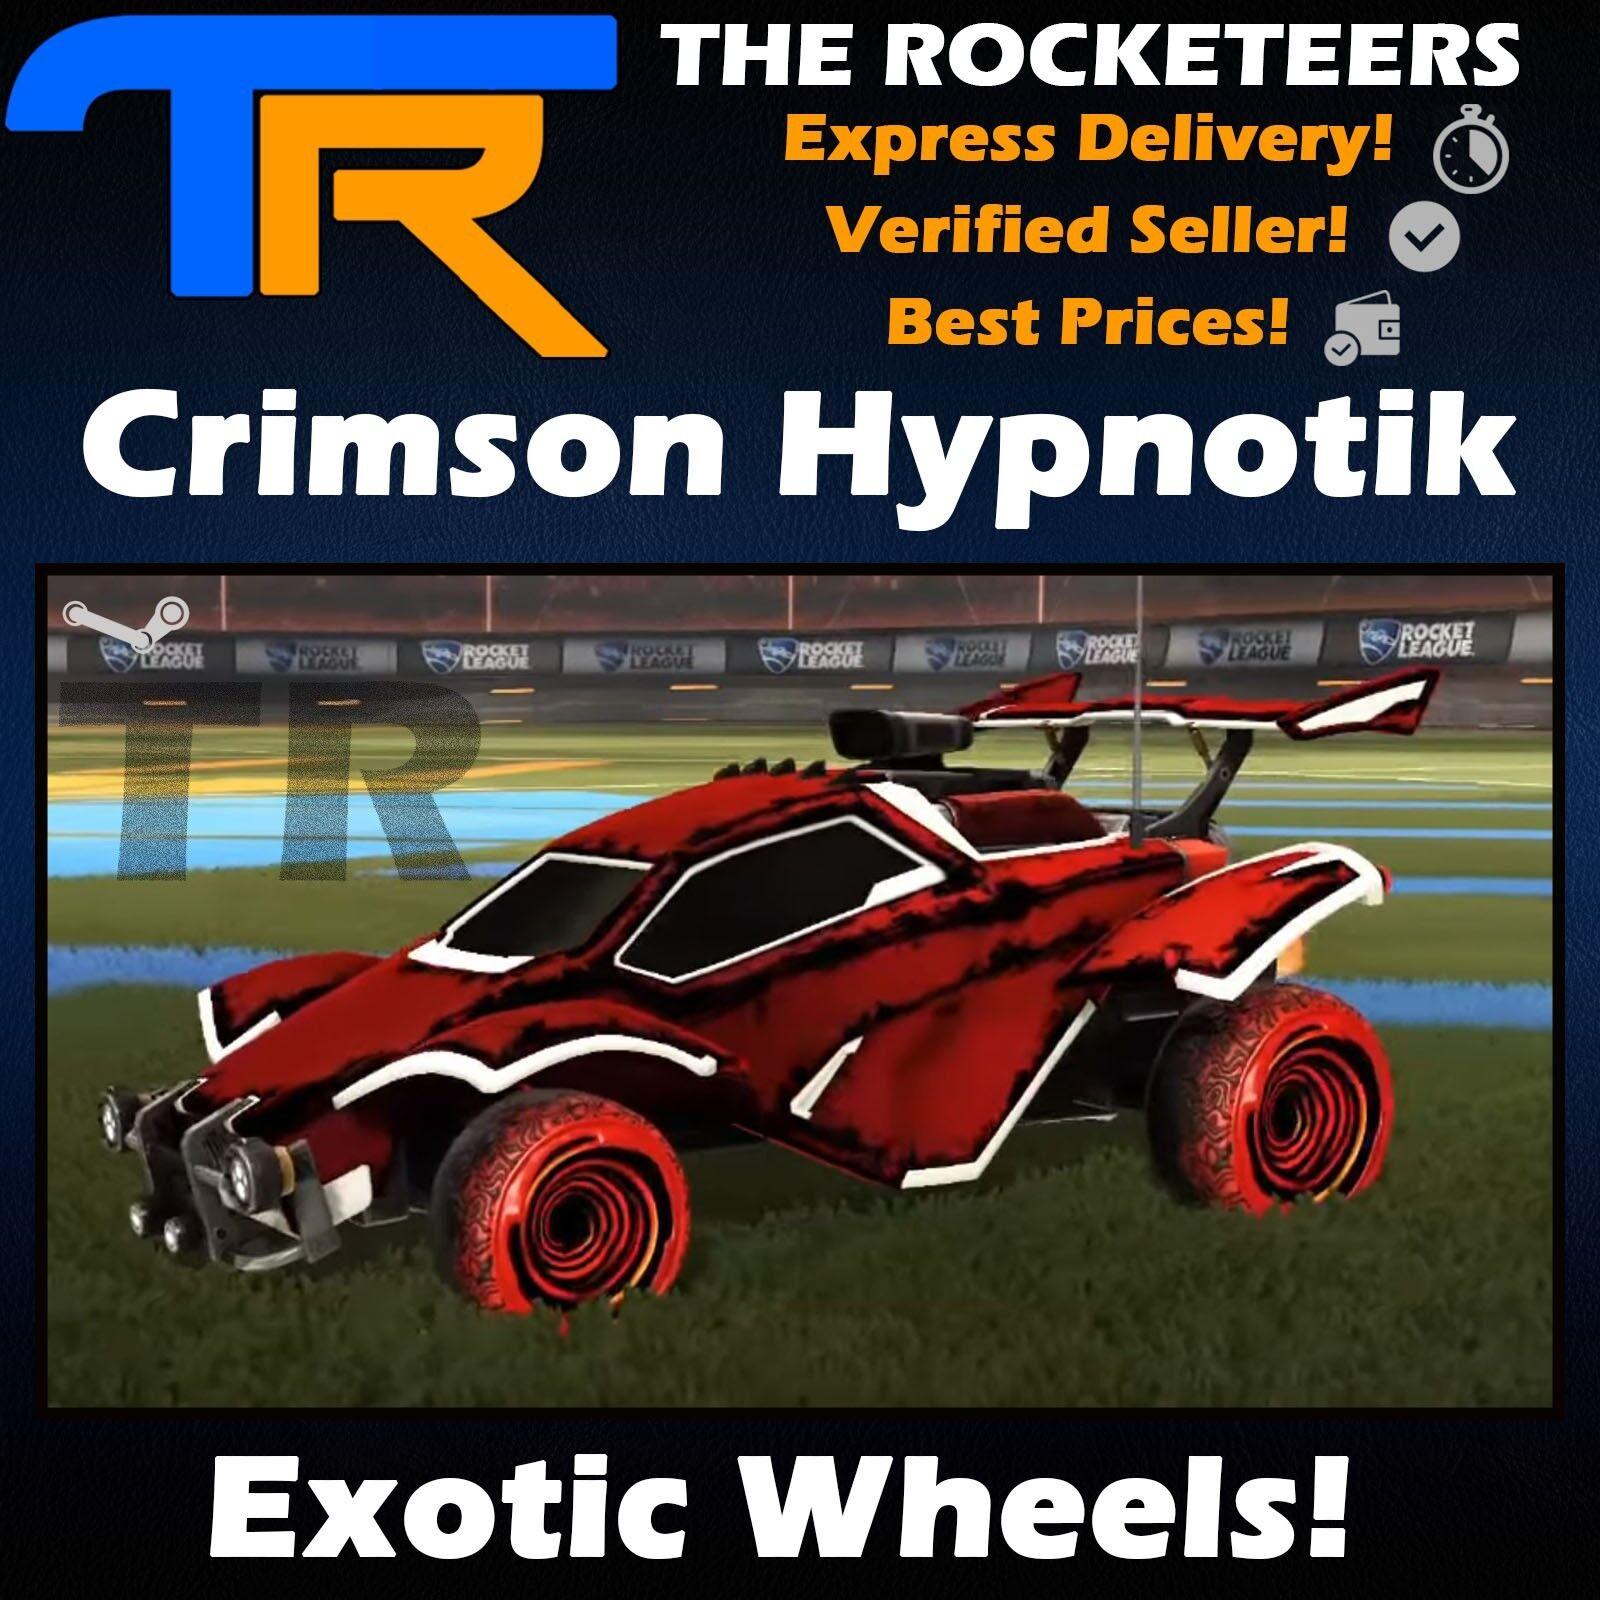 Pc Rocket League Every Painted Santa Fe Exotic Wheels Impact Crate New Ebay